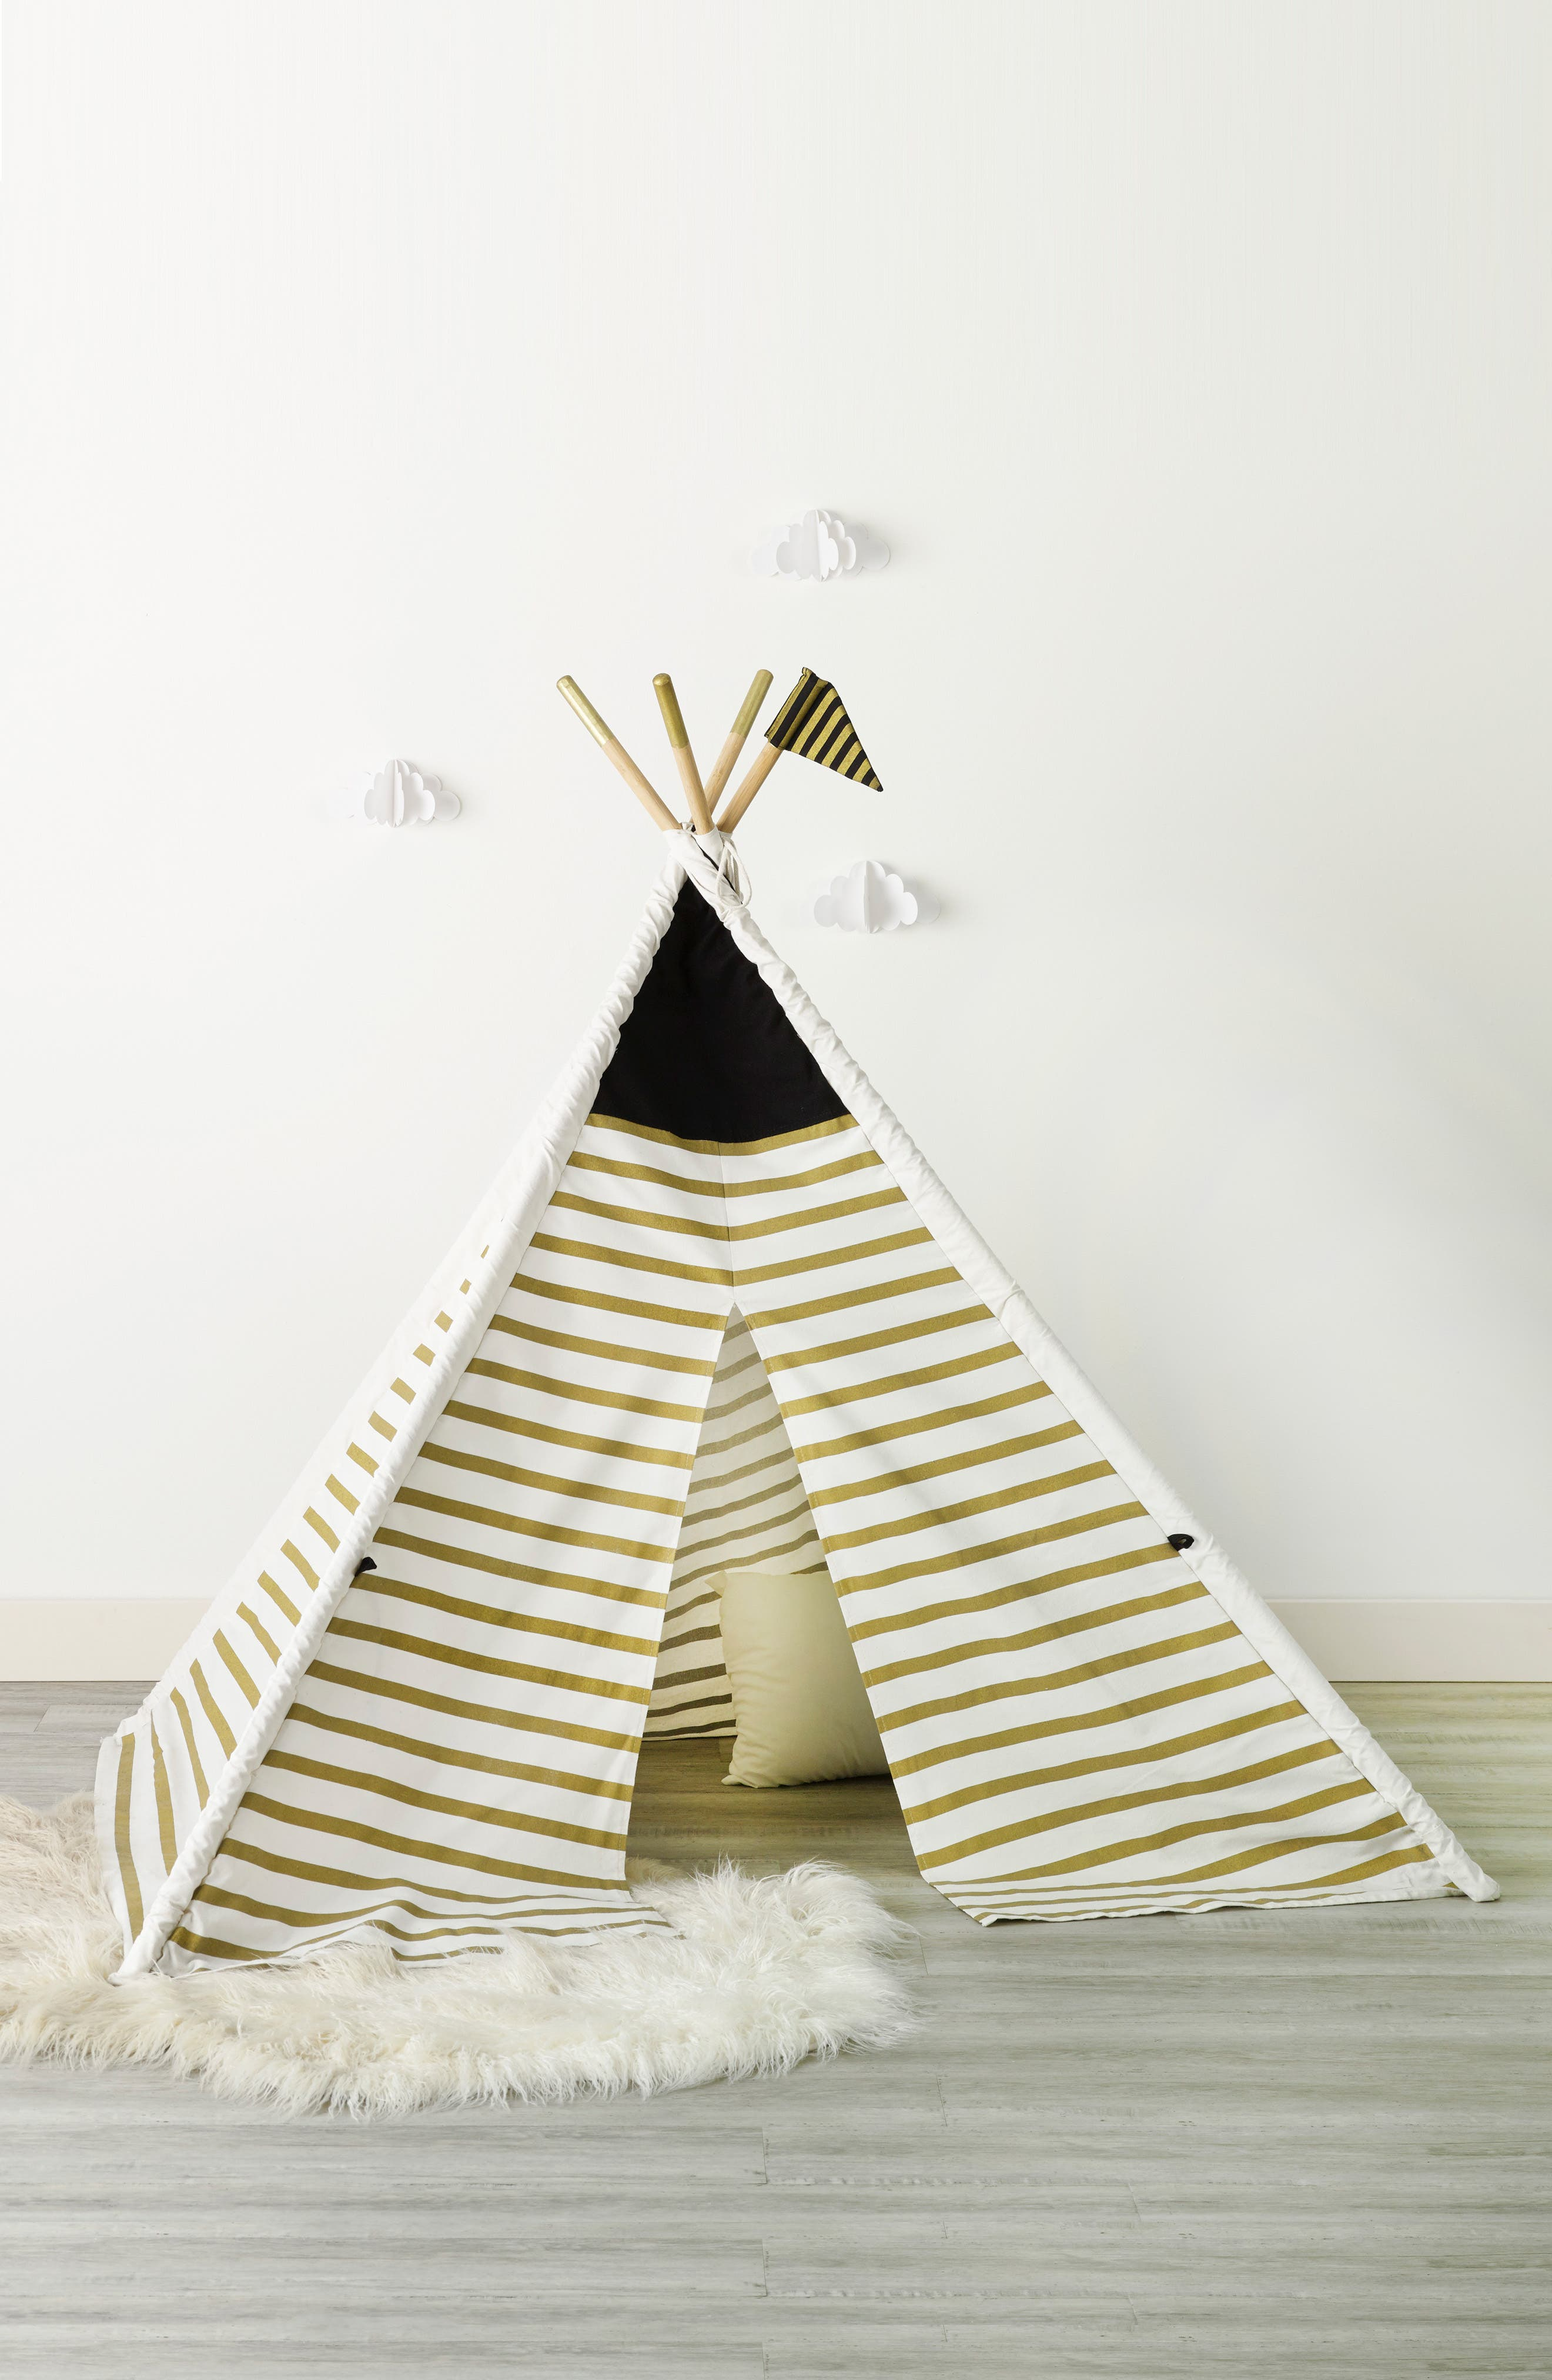 Main Image - FAO Schwarz Teepee Play Tent & FAO Schwarz Teepee Play Tent | Nordstrom